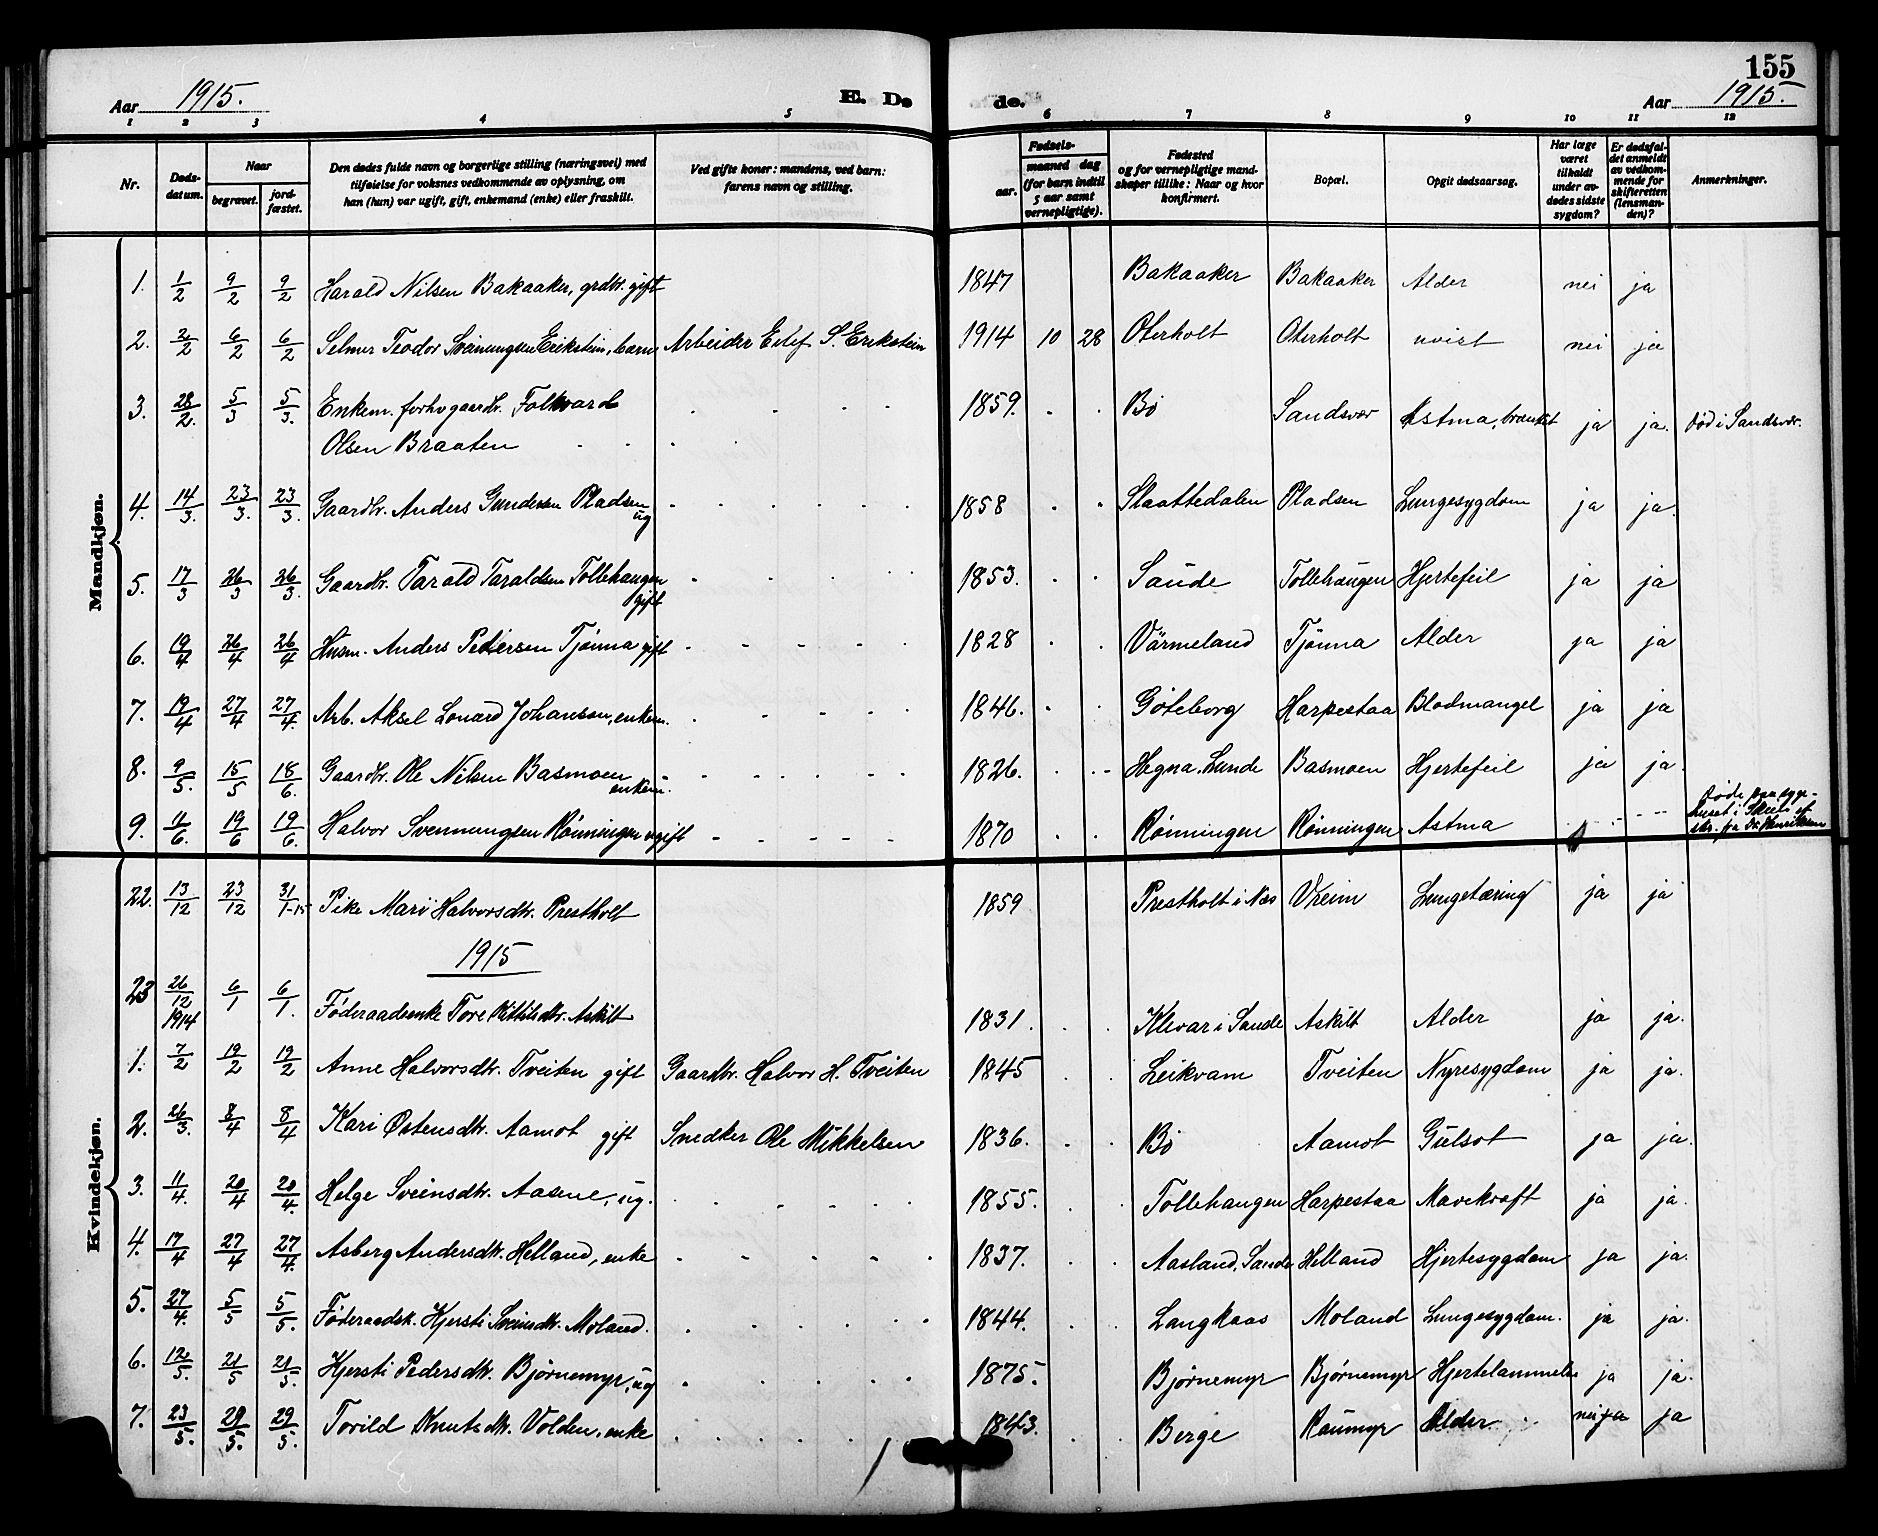 SAKO, Bø kirkebøker, G/Ga/L0007: Klokkerbok nr. 7, 1909-1924, s. 155